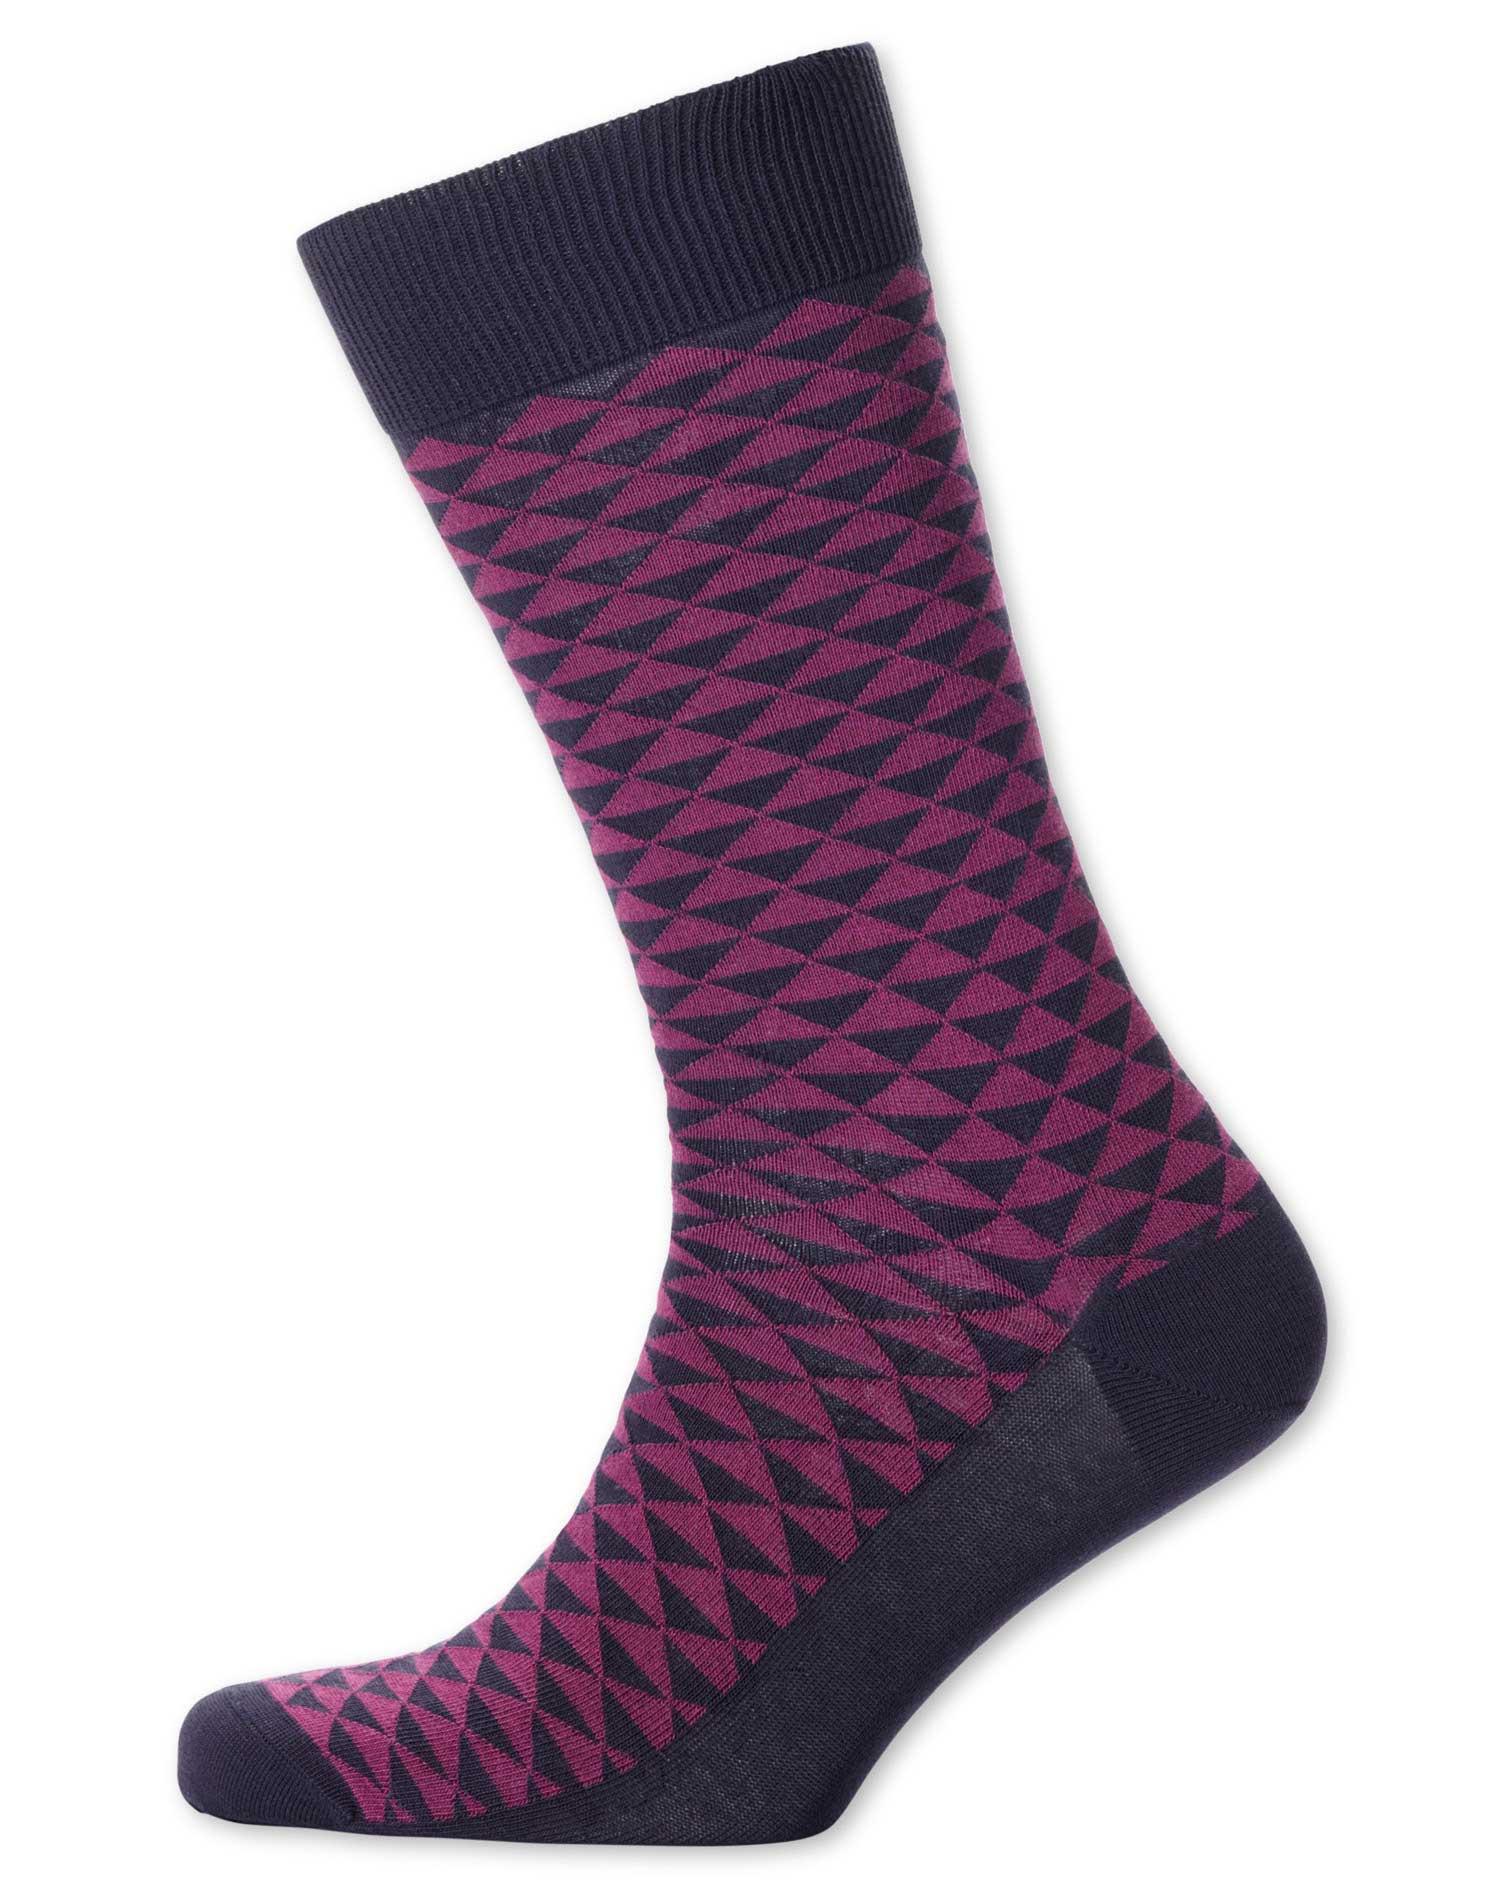 Berry Triangle Socks Size Medium by Charles Tyrwhitt